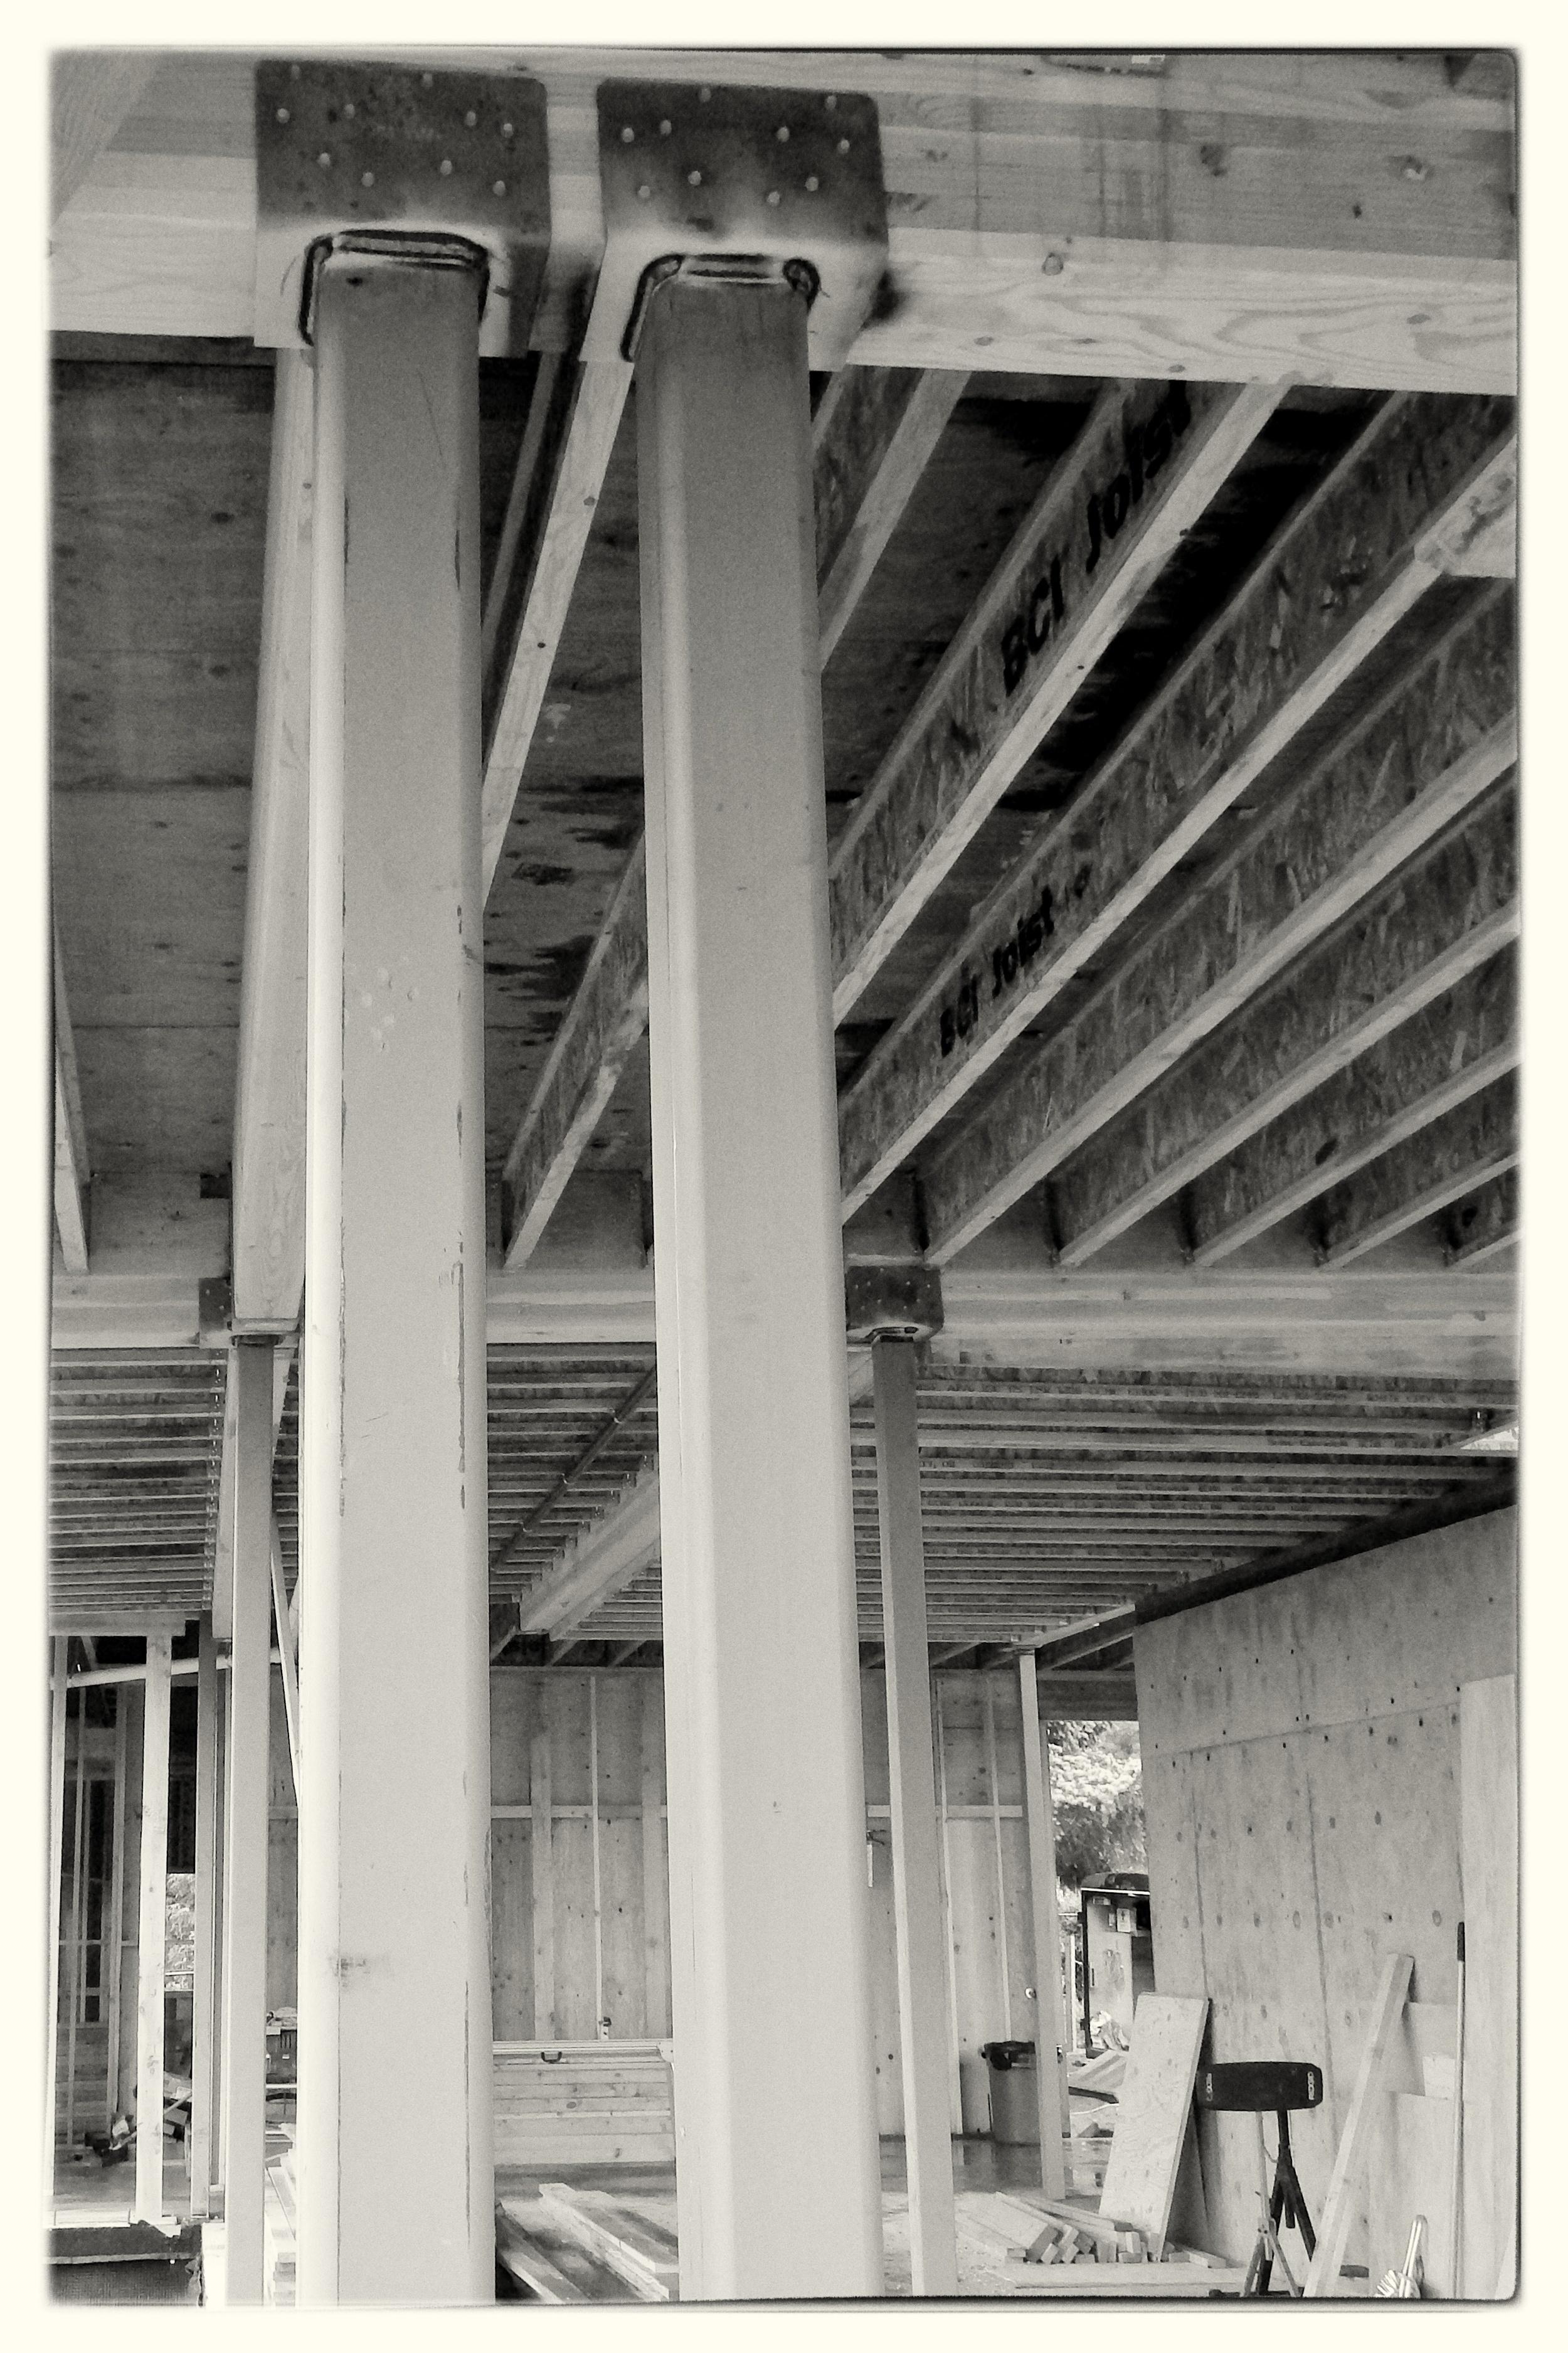 HSS Steel Posts Installed Inside Home - Portland